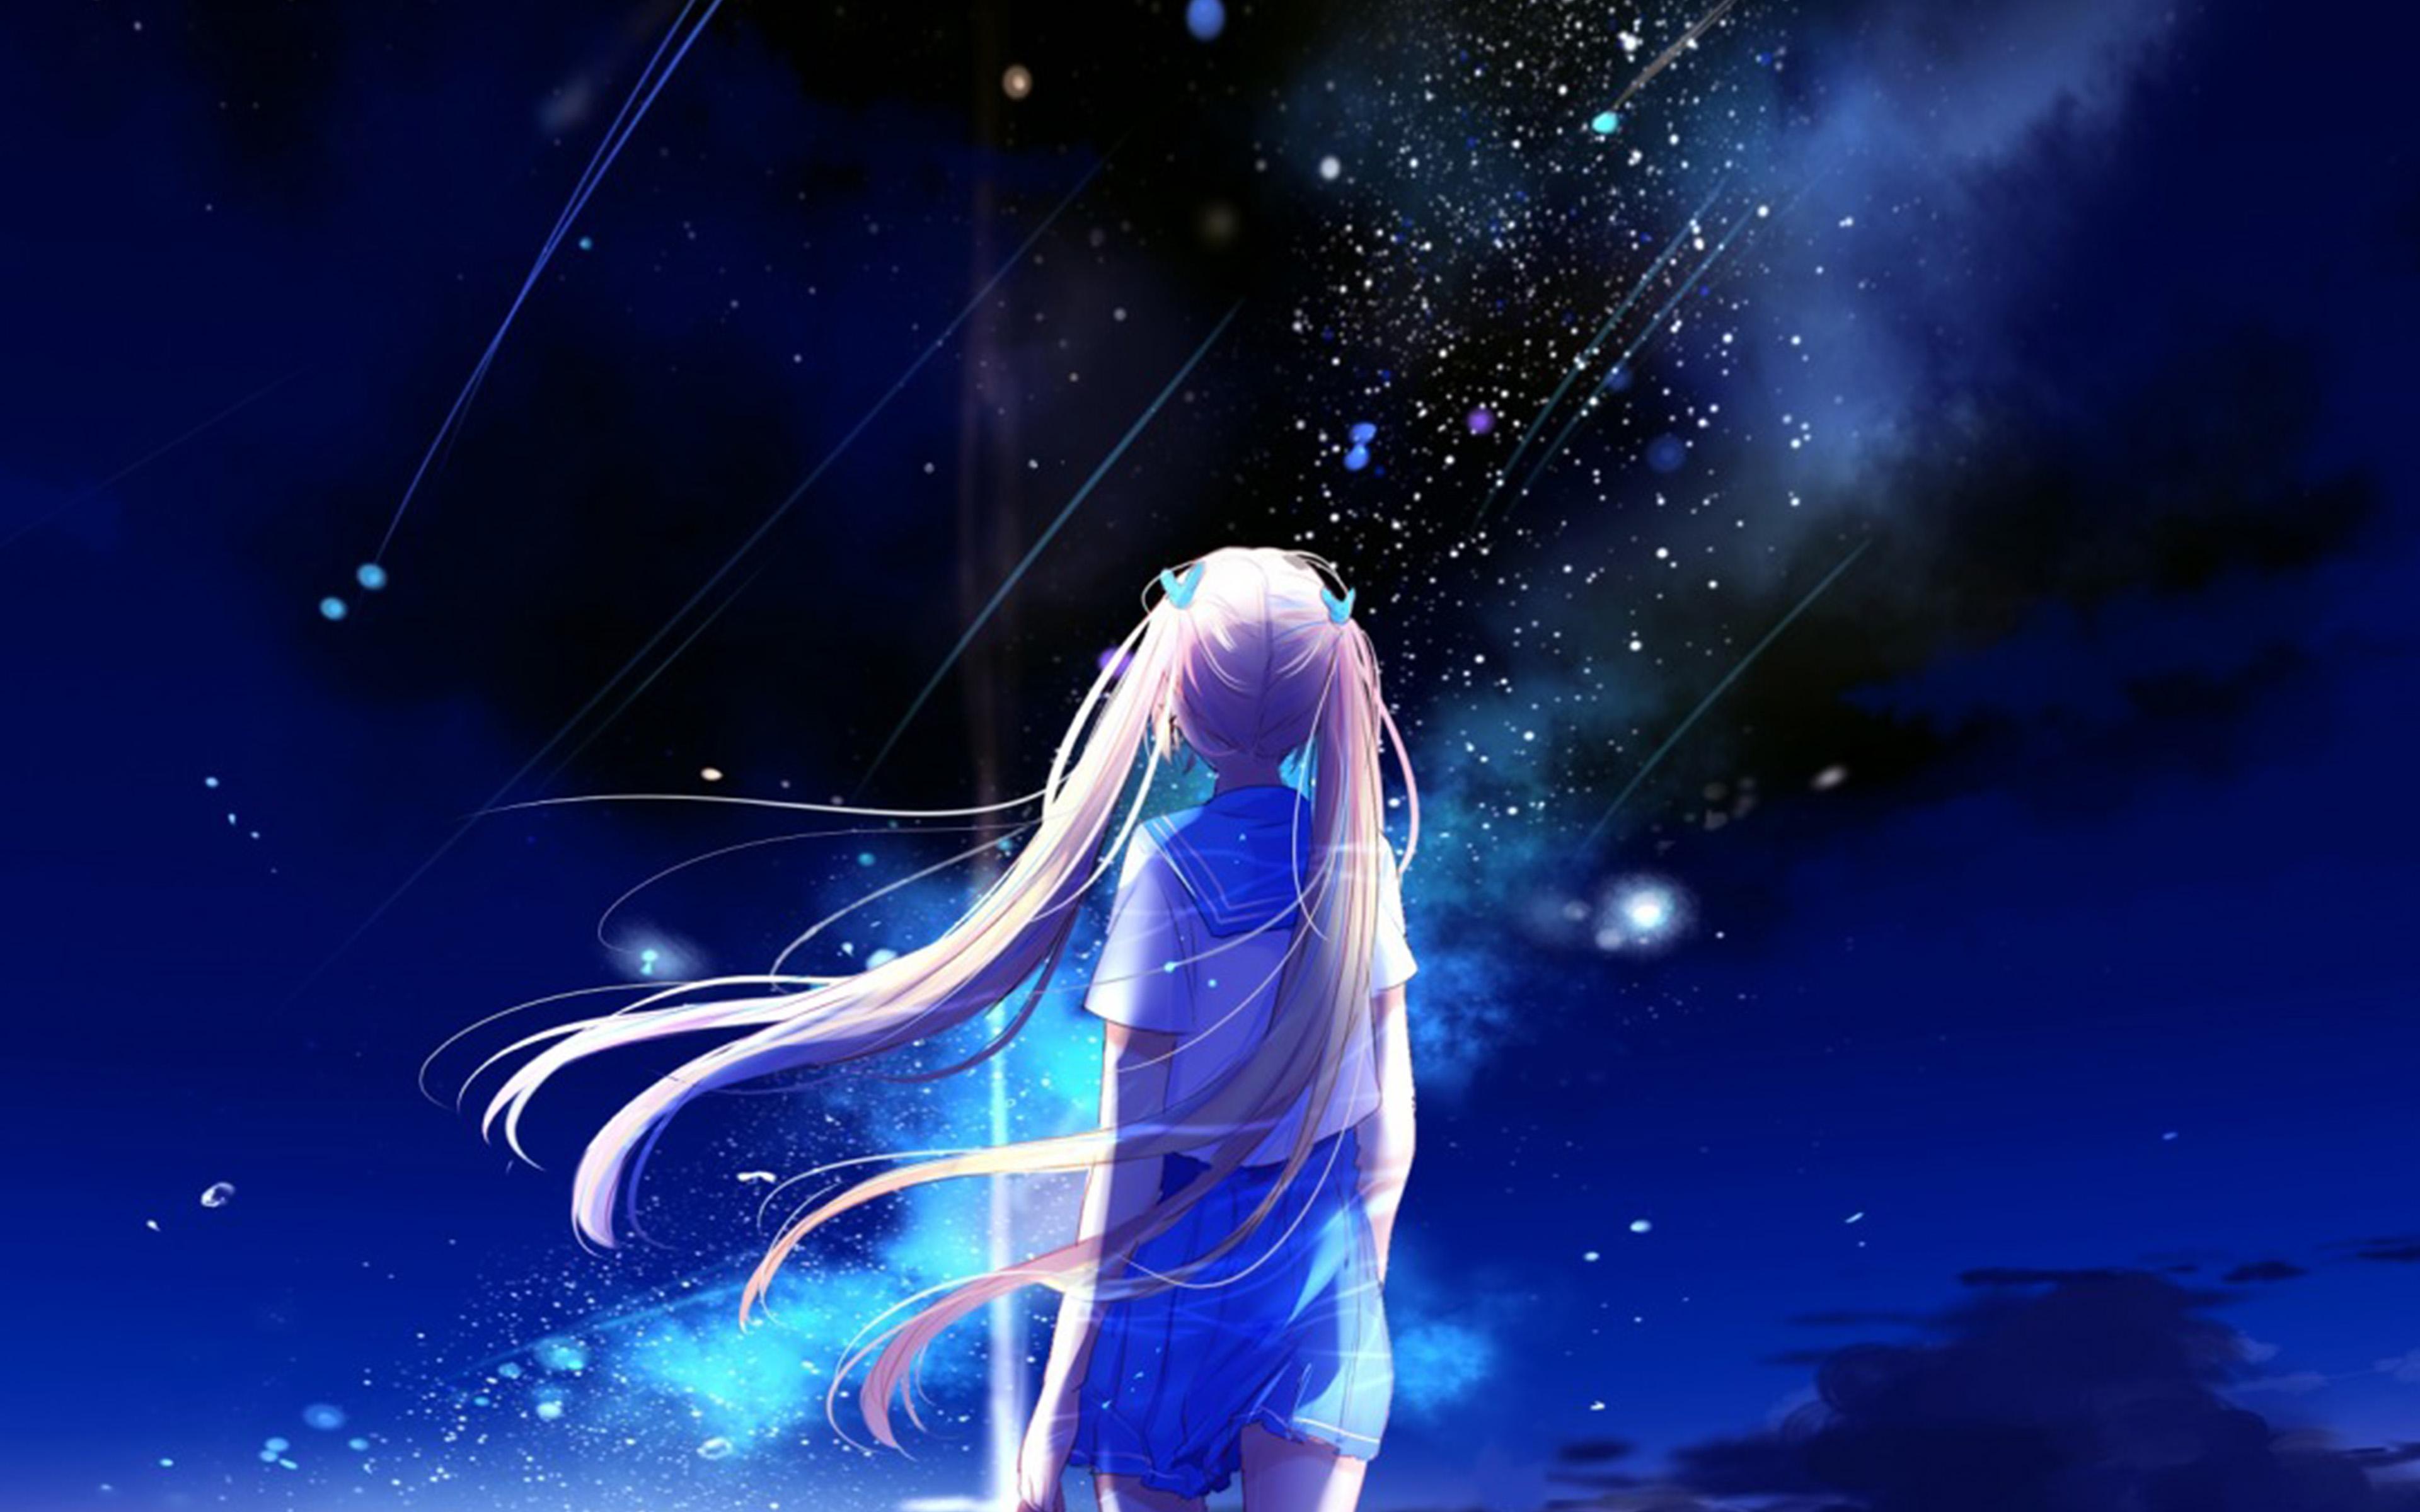 Hd 2160 Wallpapers Girl Bc64 Anime Night Space Star Art Illustration Wallpaper